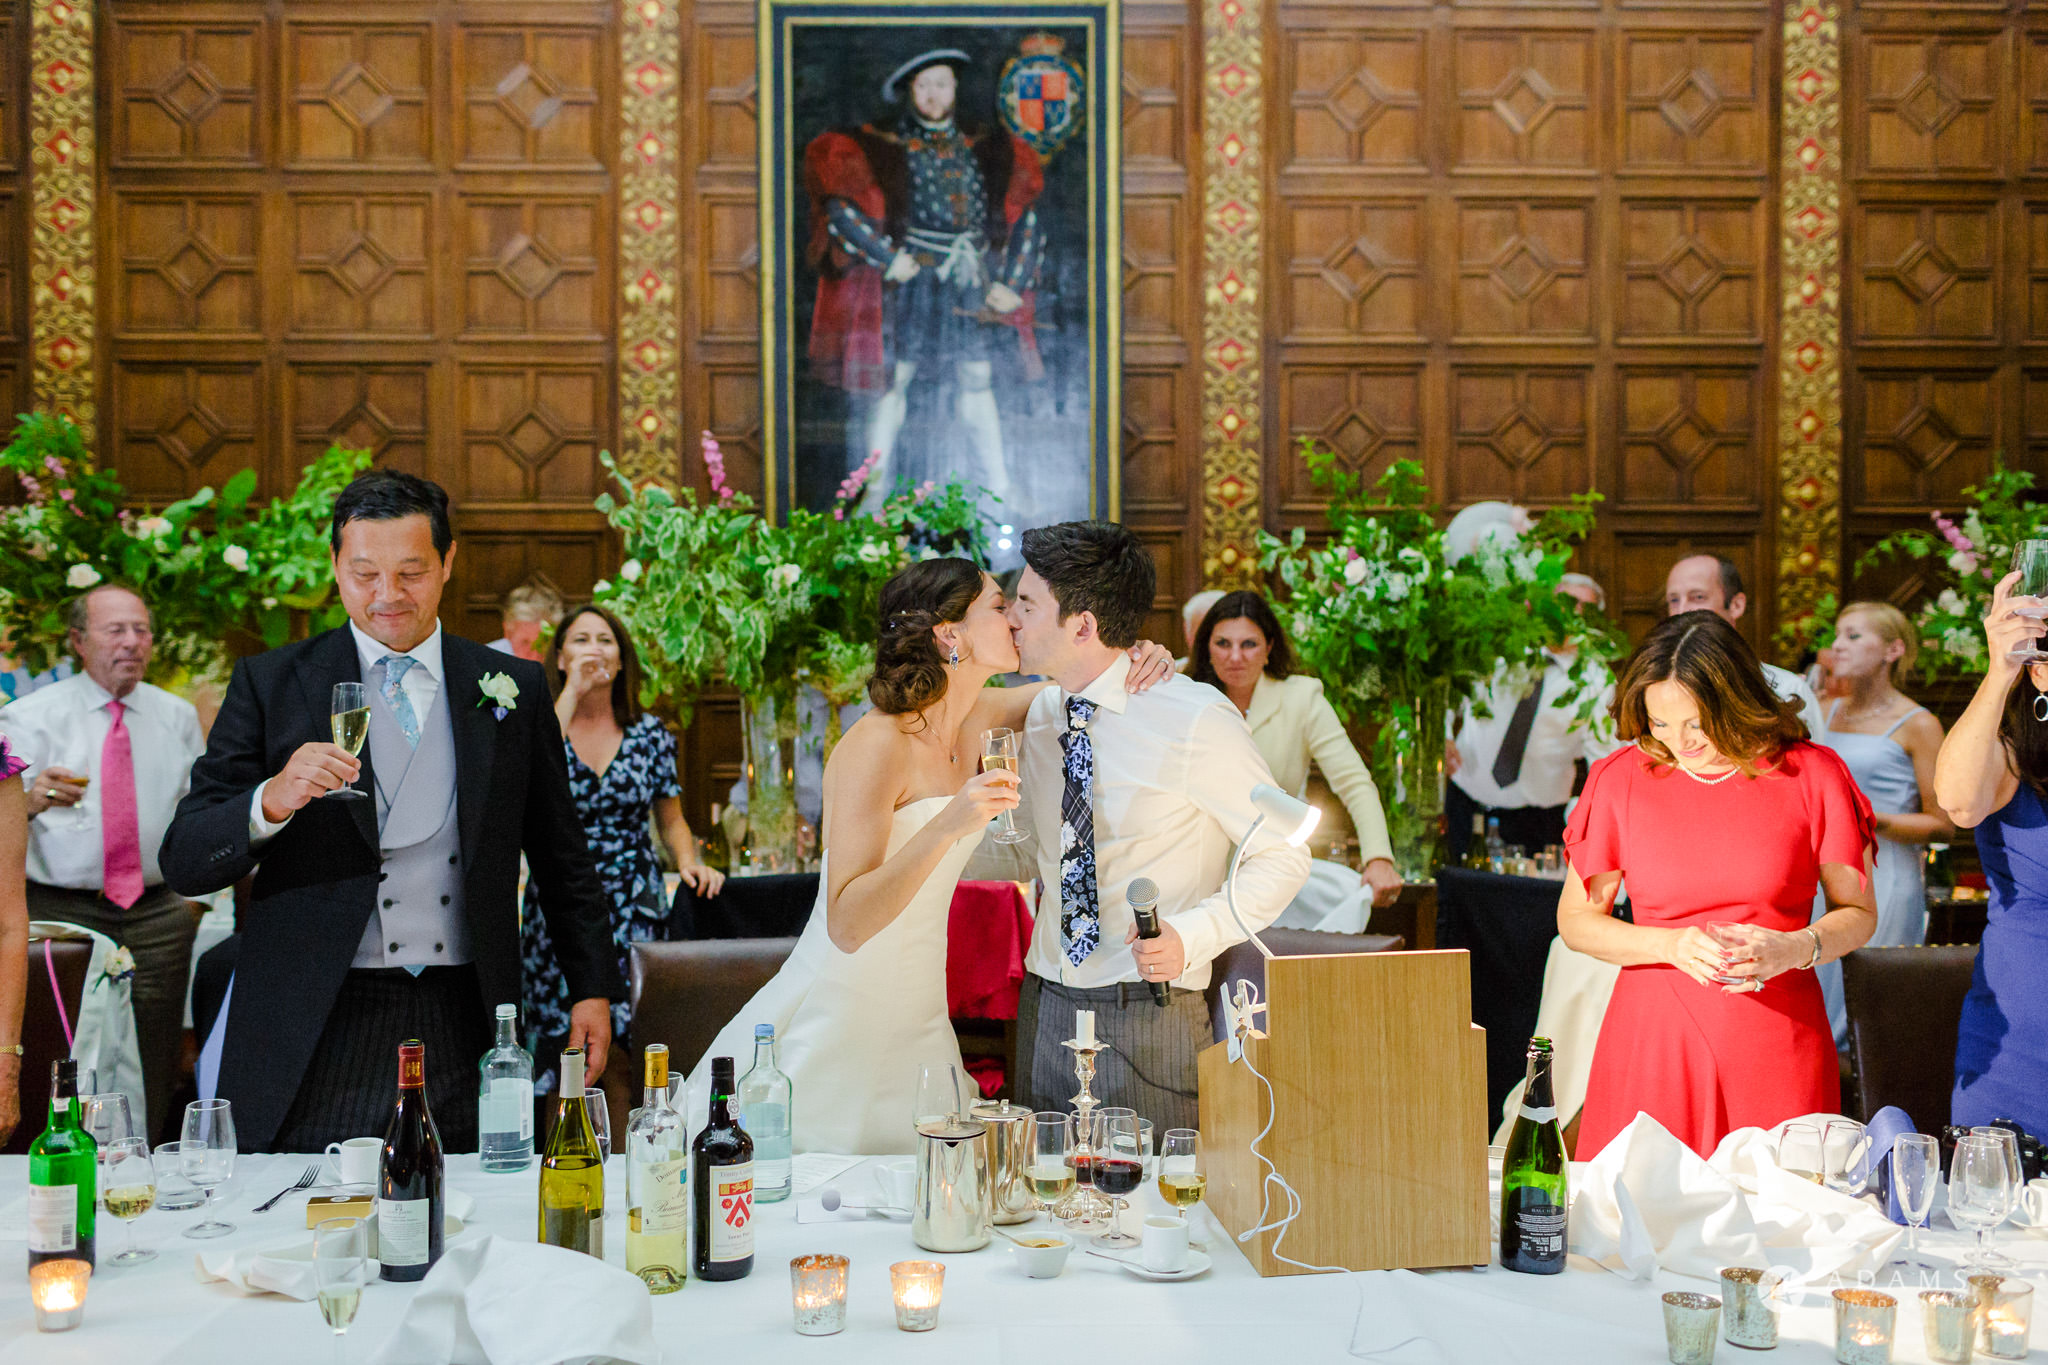 Trinity College Cambridge wedding bride and groom kiss